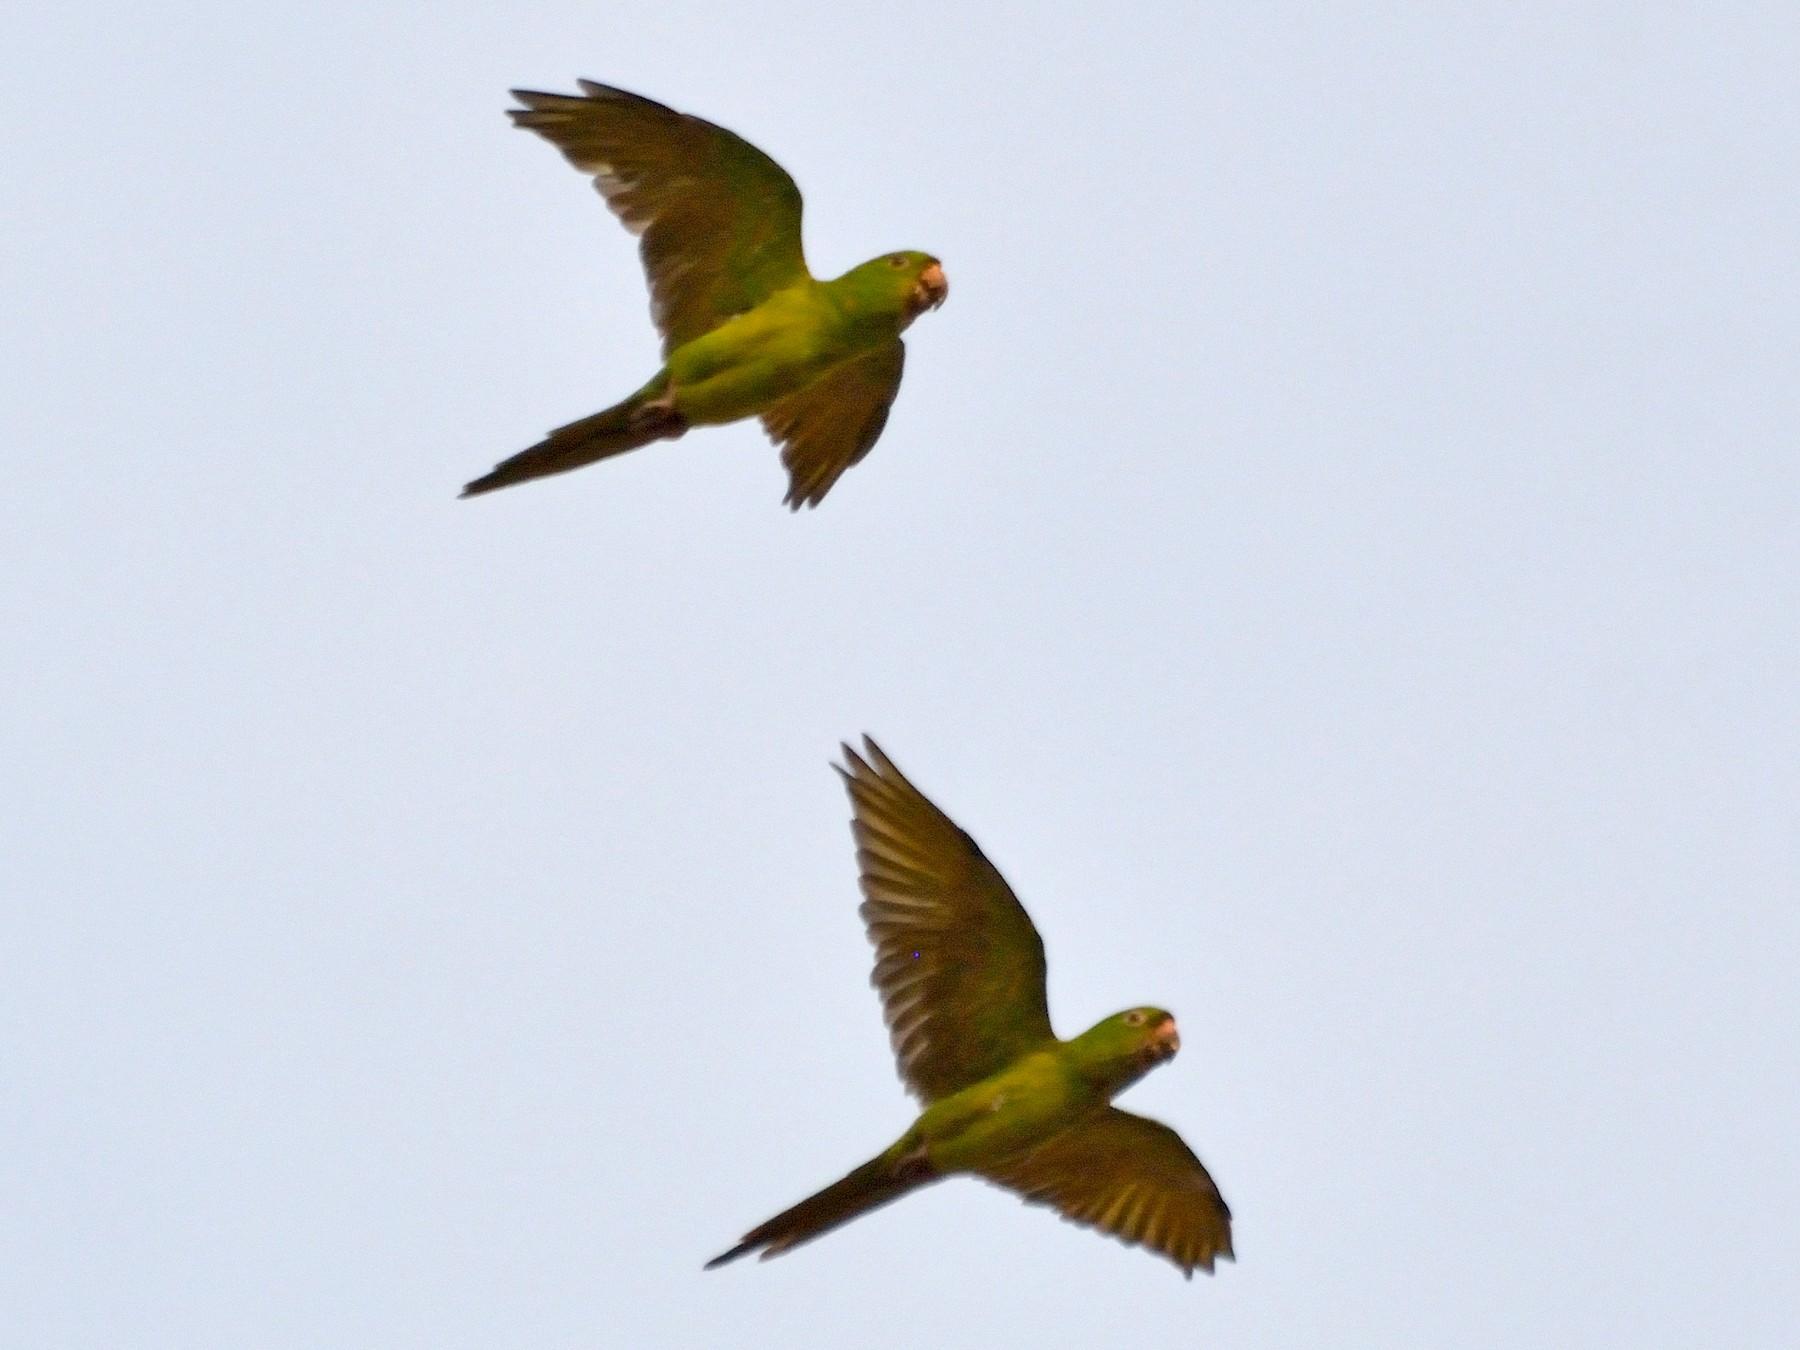 Pacific Parakeet - Orlando Jarquín